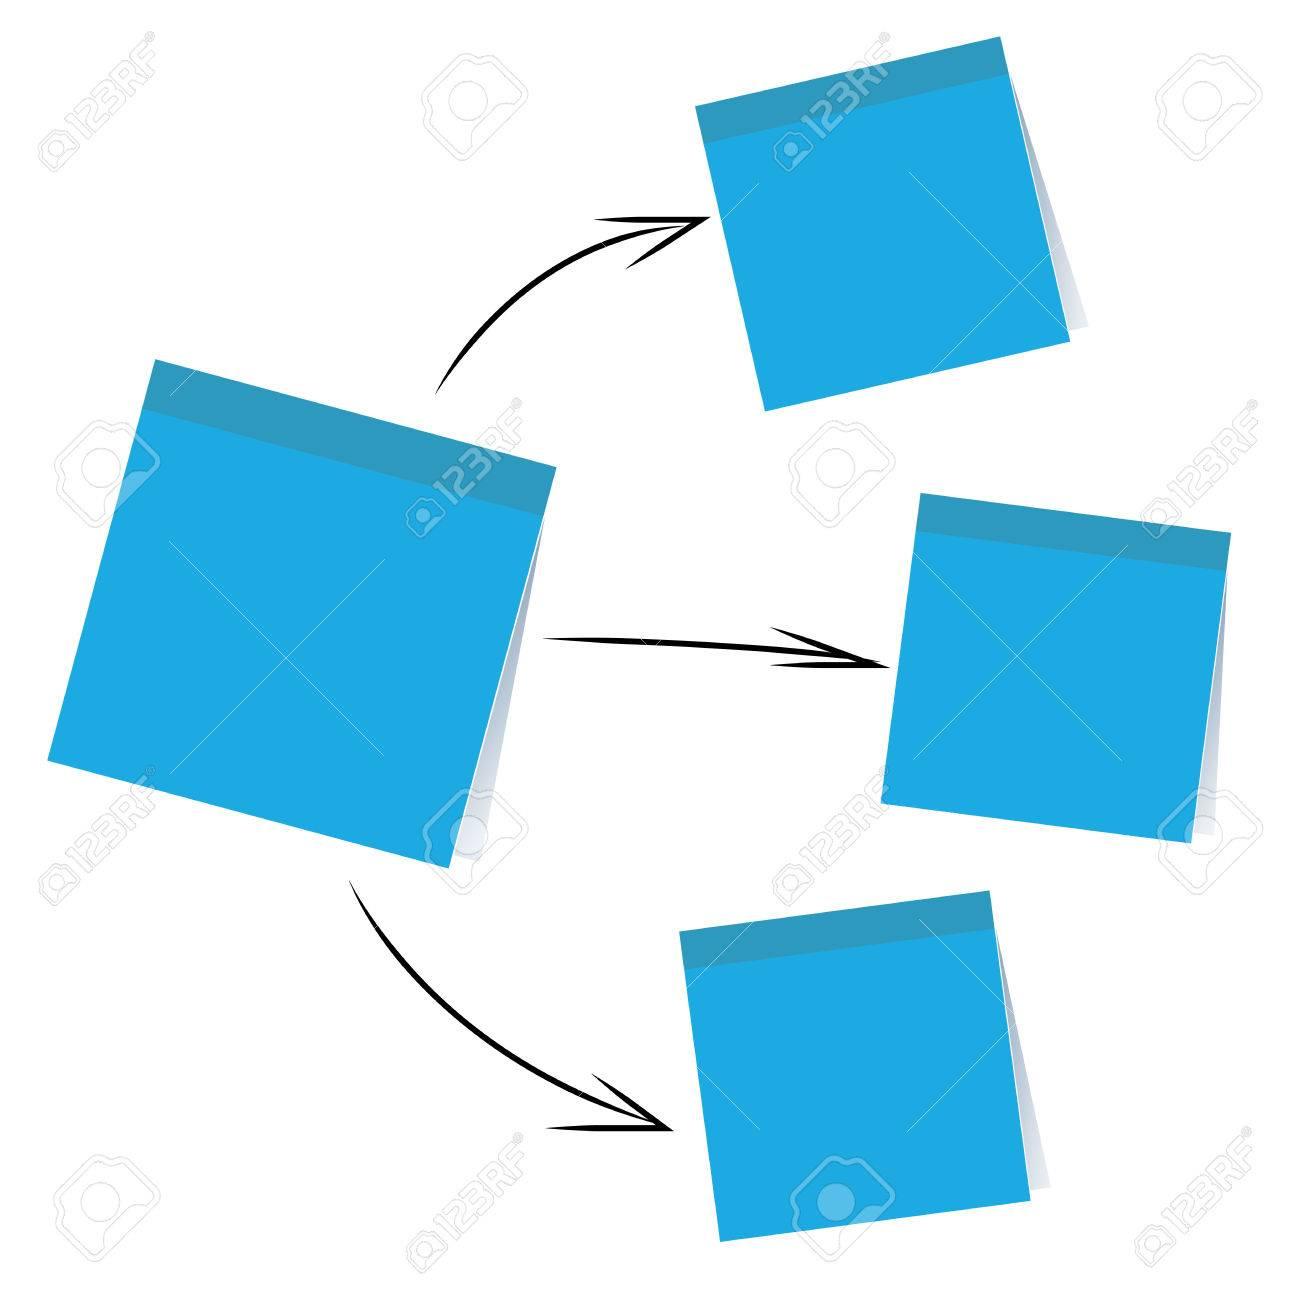 stick note paper chart - 45756126